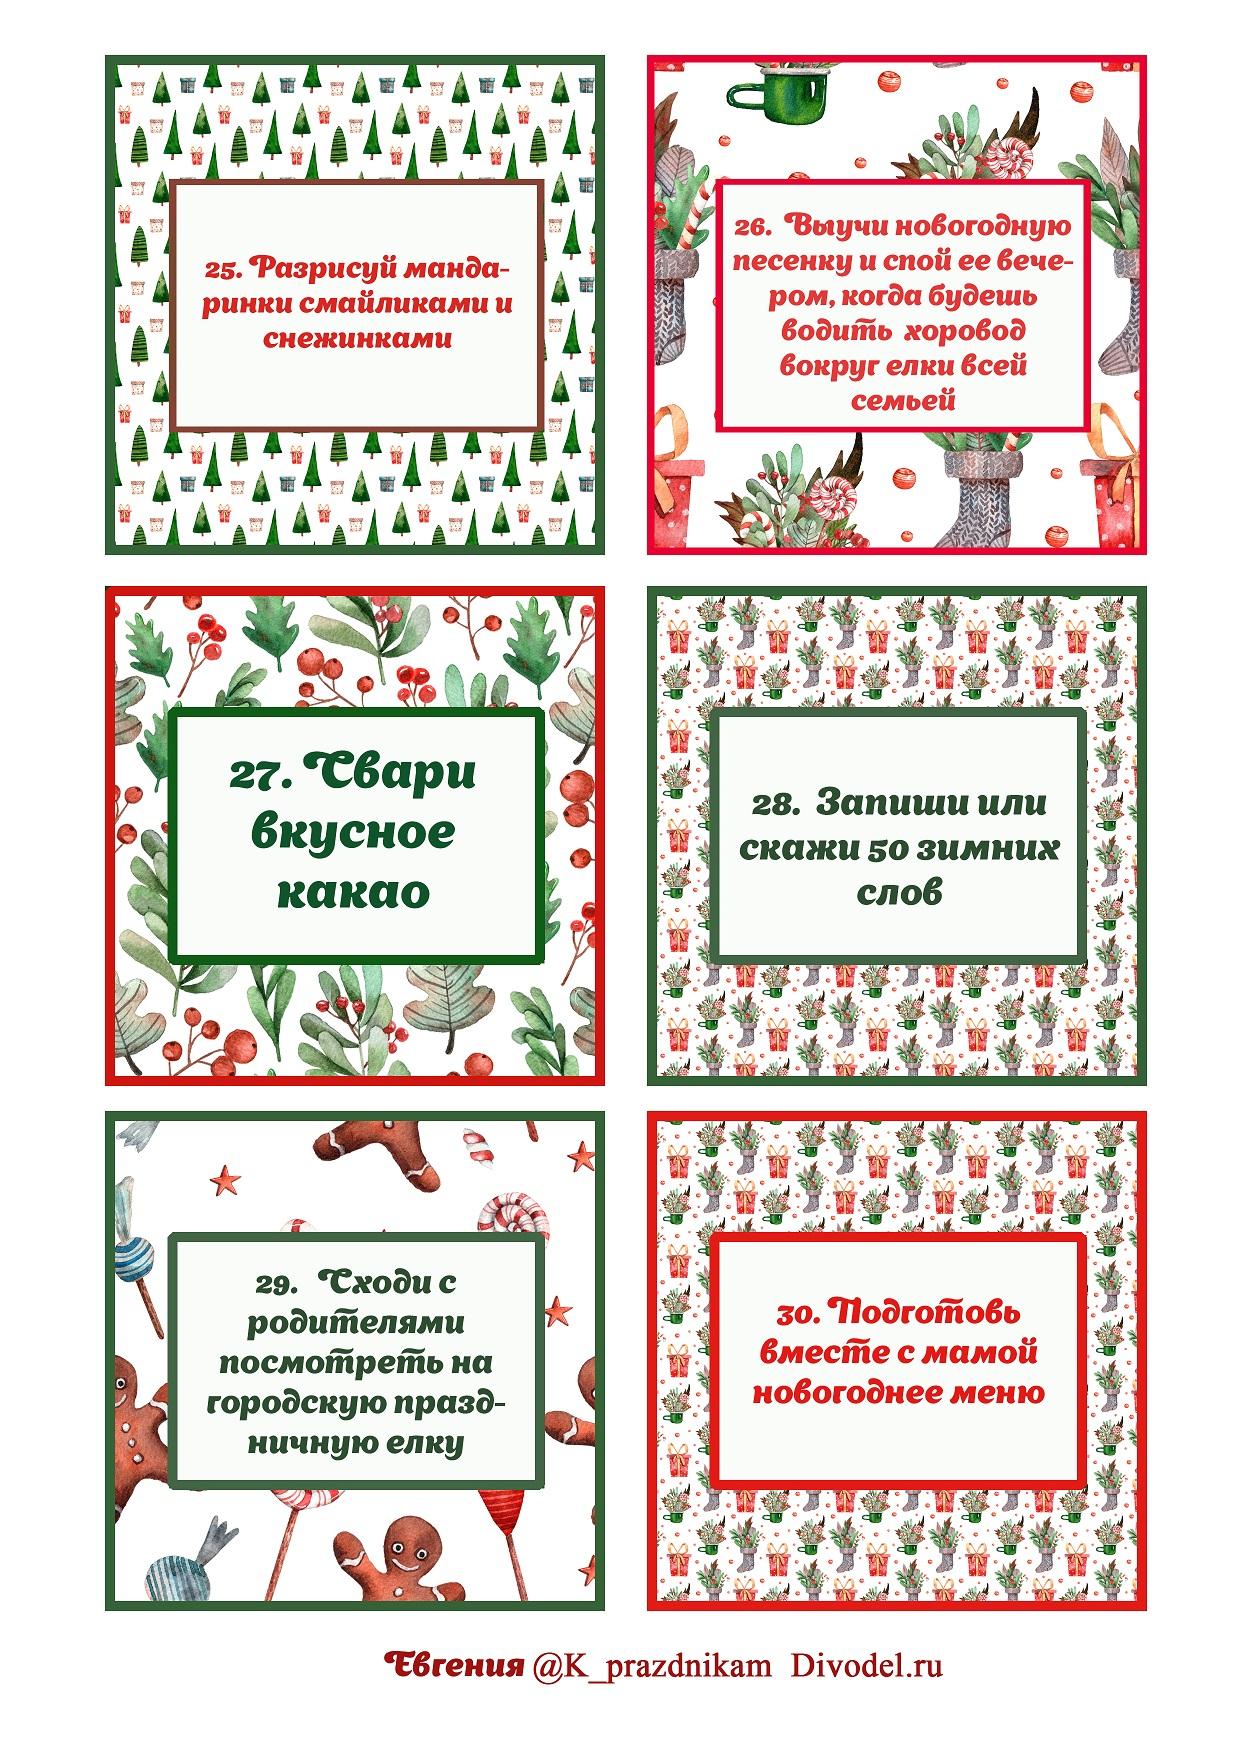 задания для адвента, задания для адвент-календаря, карточки для адвента, адвен-календарь, детский адвент-календарь